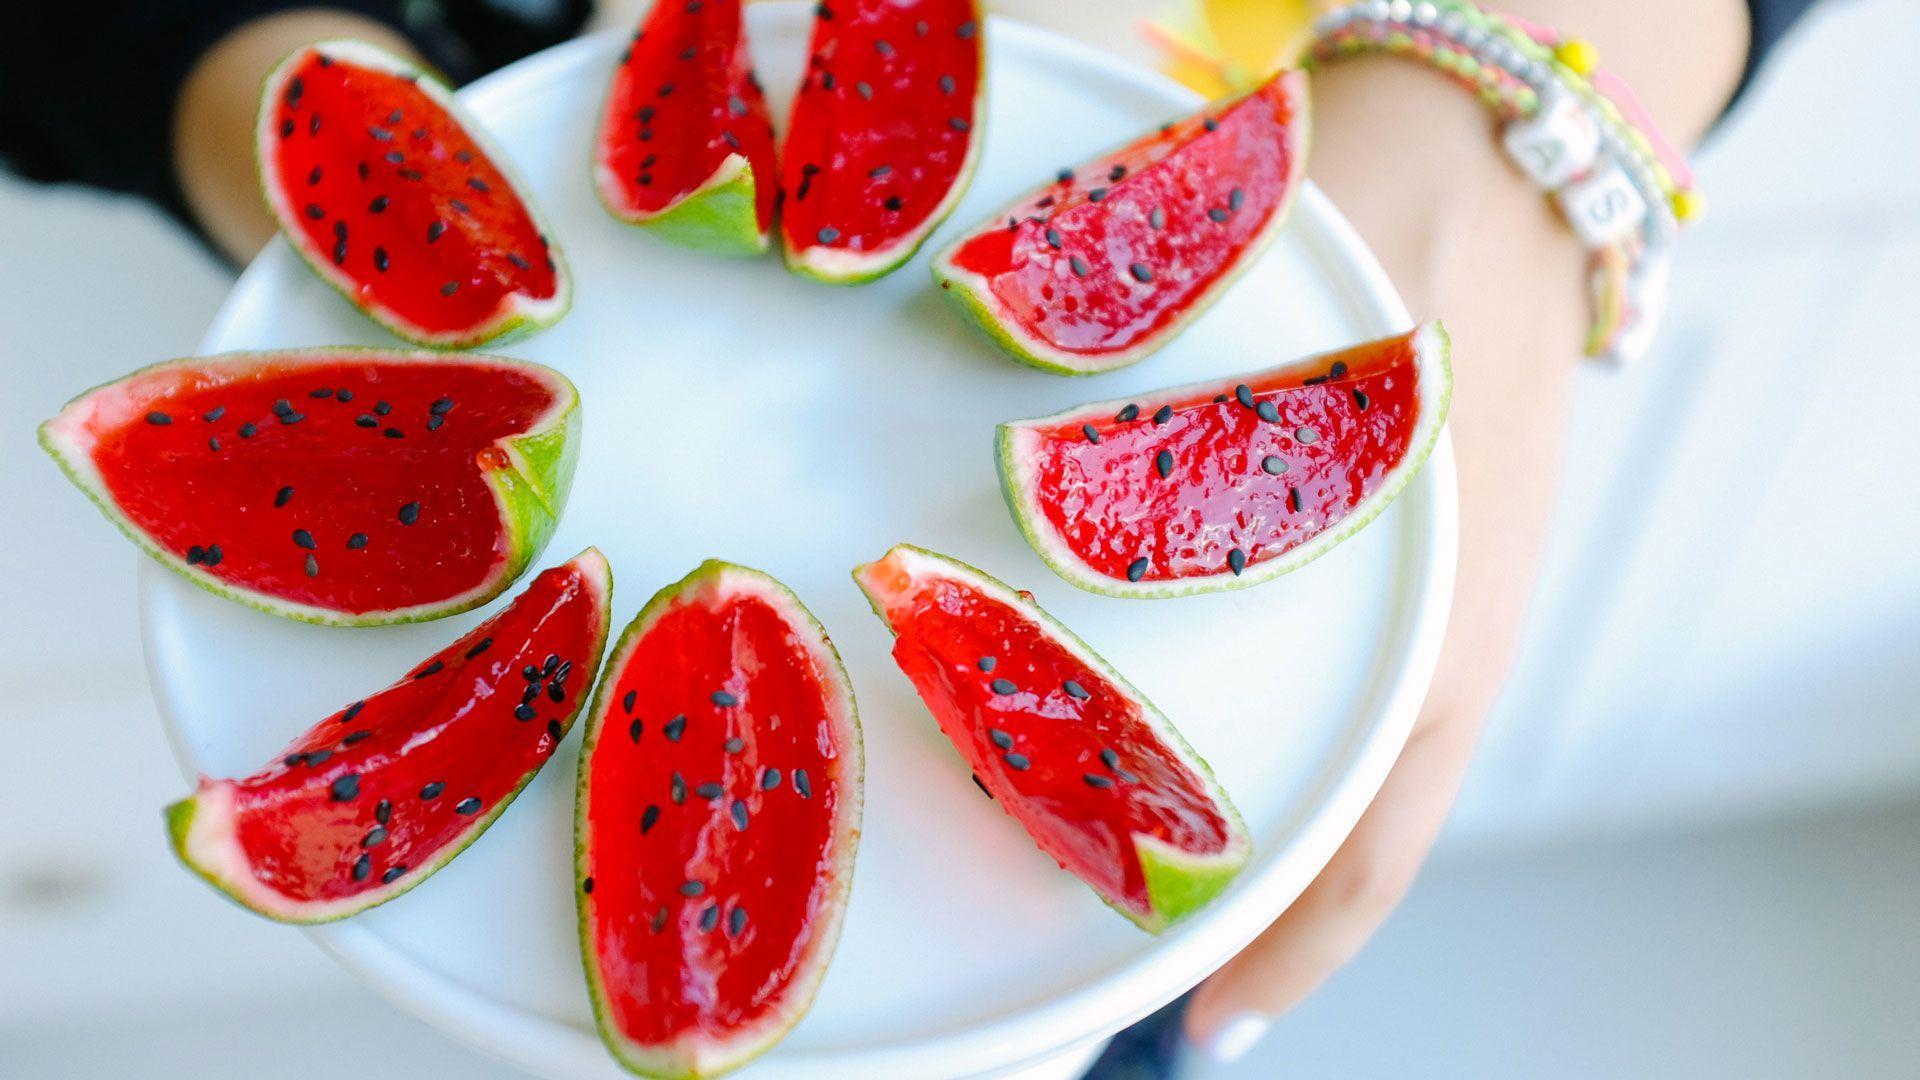 How to Make Mini Jell-O Watermelon